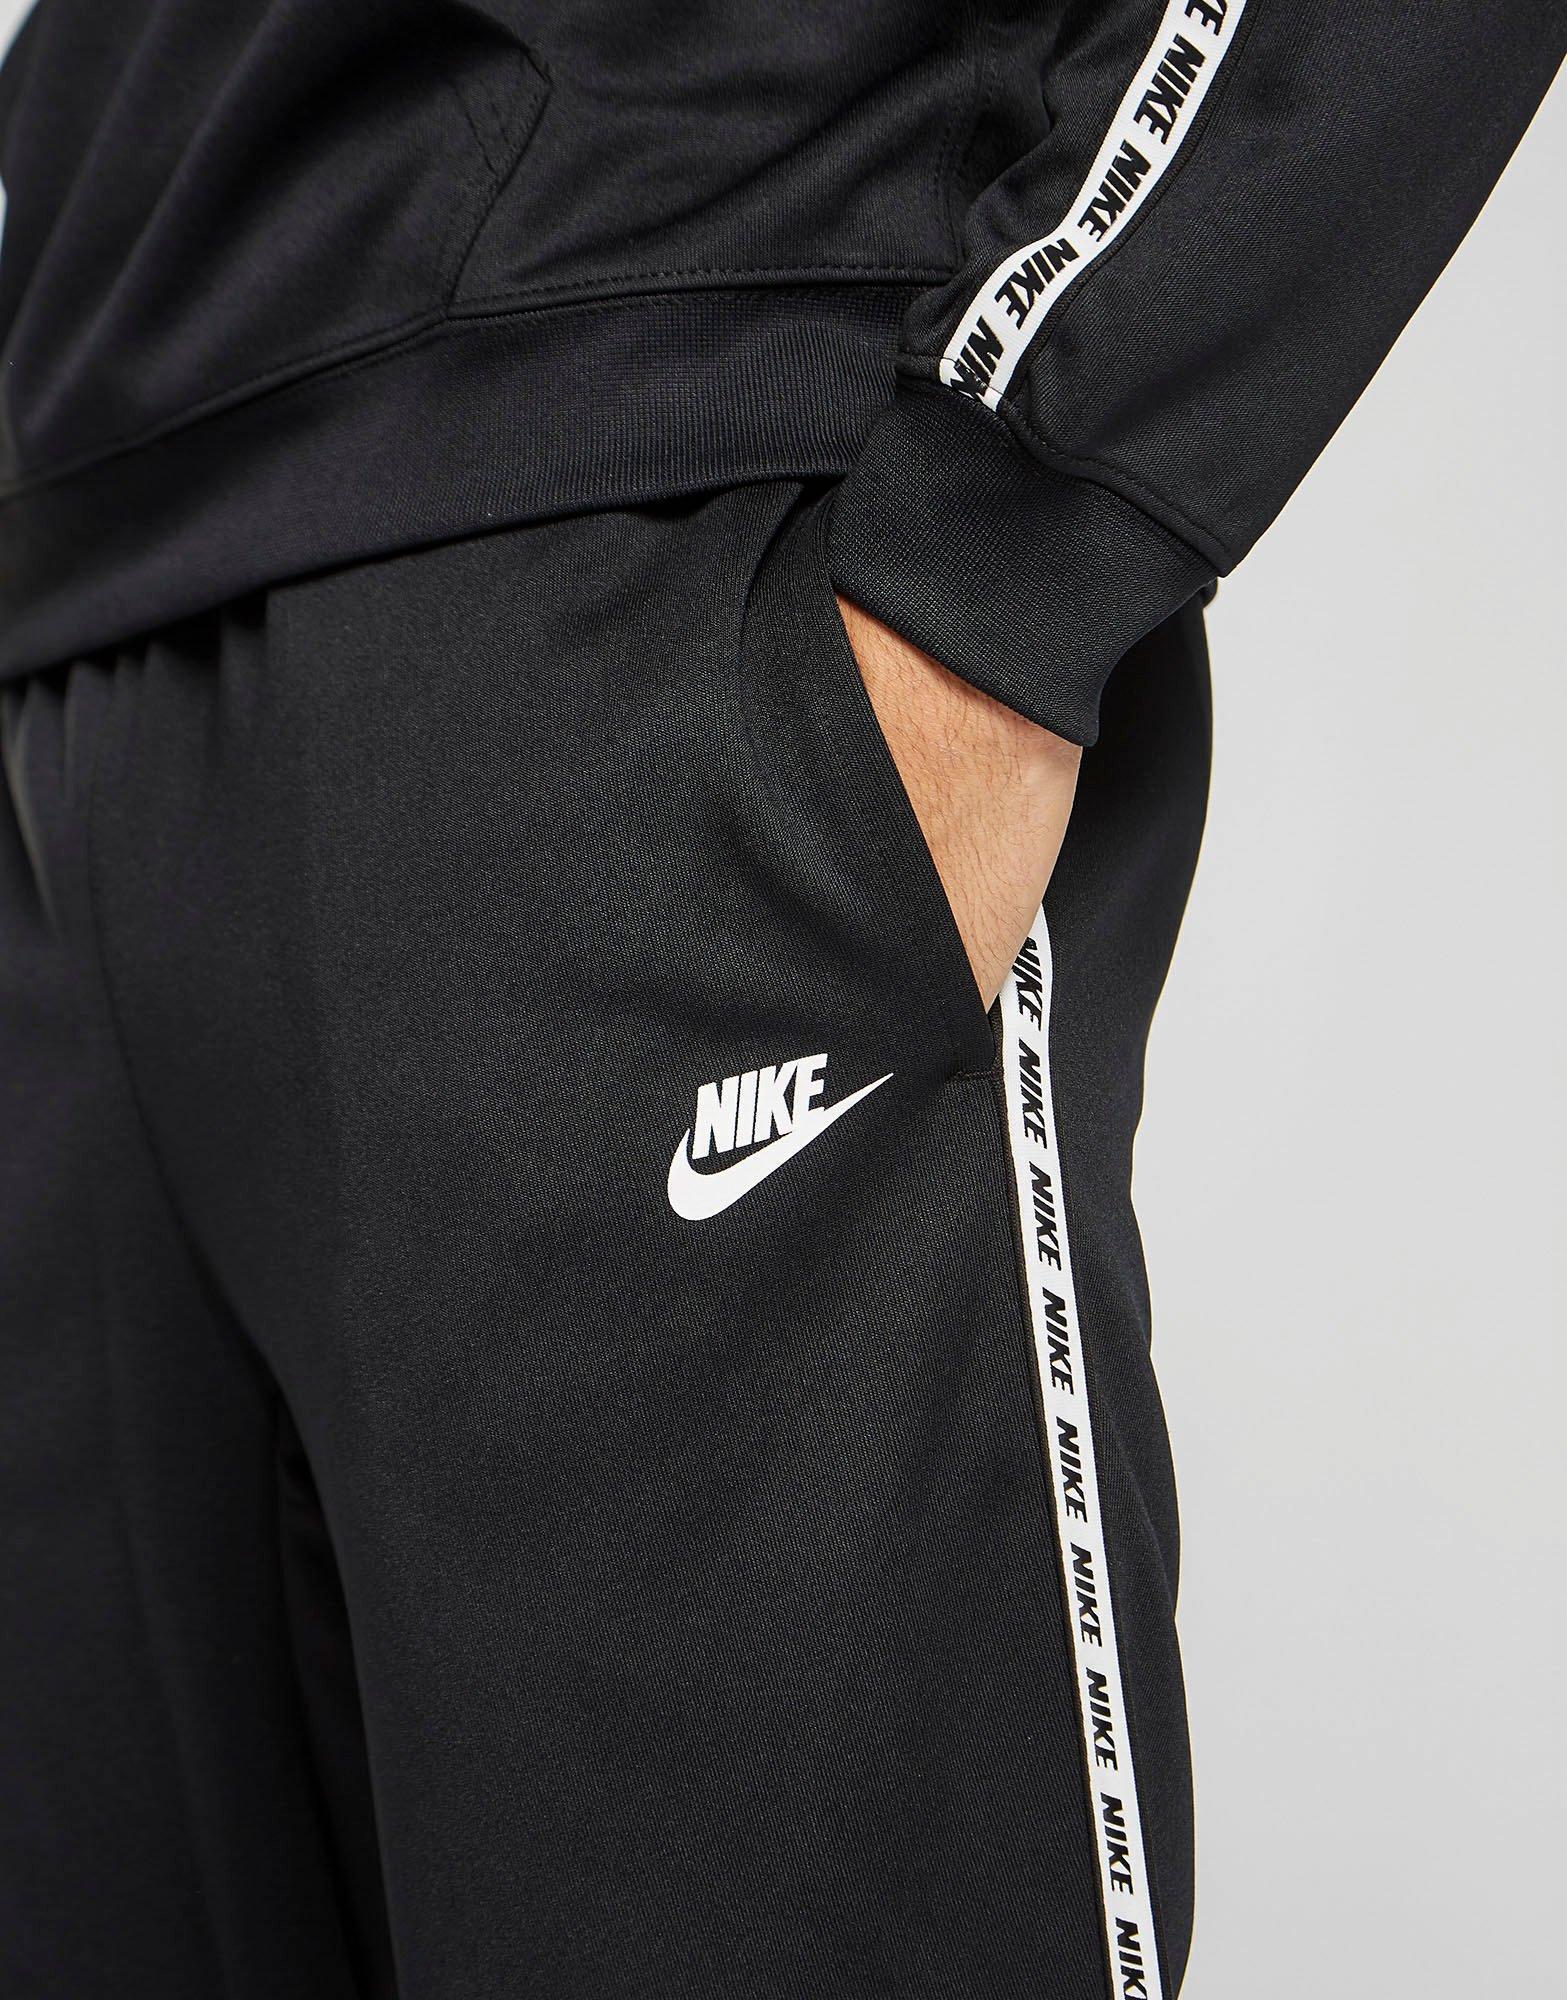 Prestado yeso preferible  Nike Synthetic Gel Tape Cuffed Track Pants in Black/White (Black) for Men -  Lyst